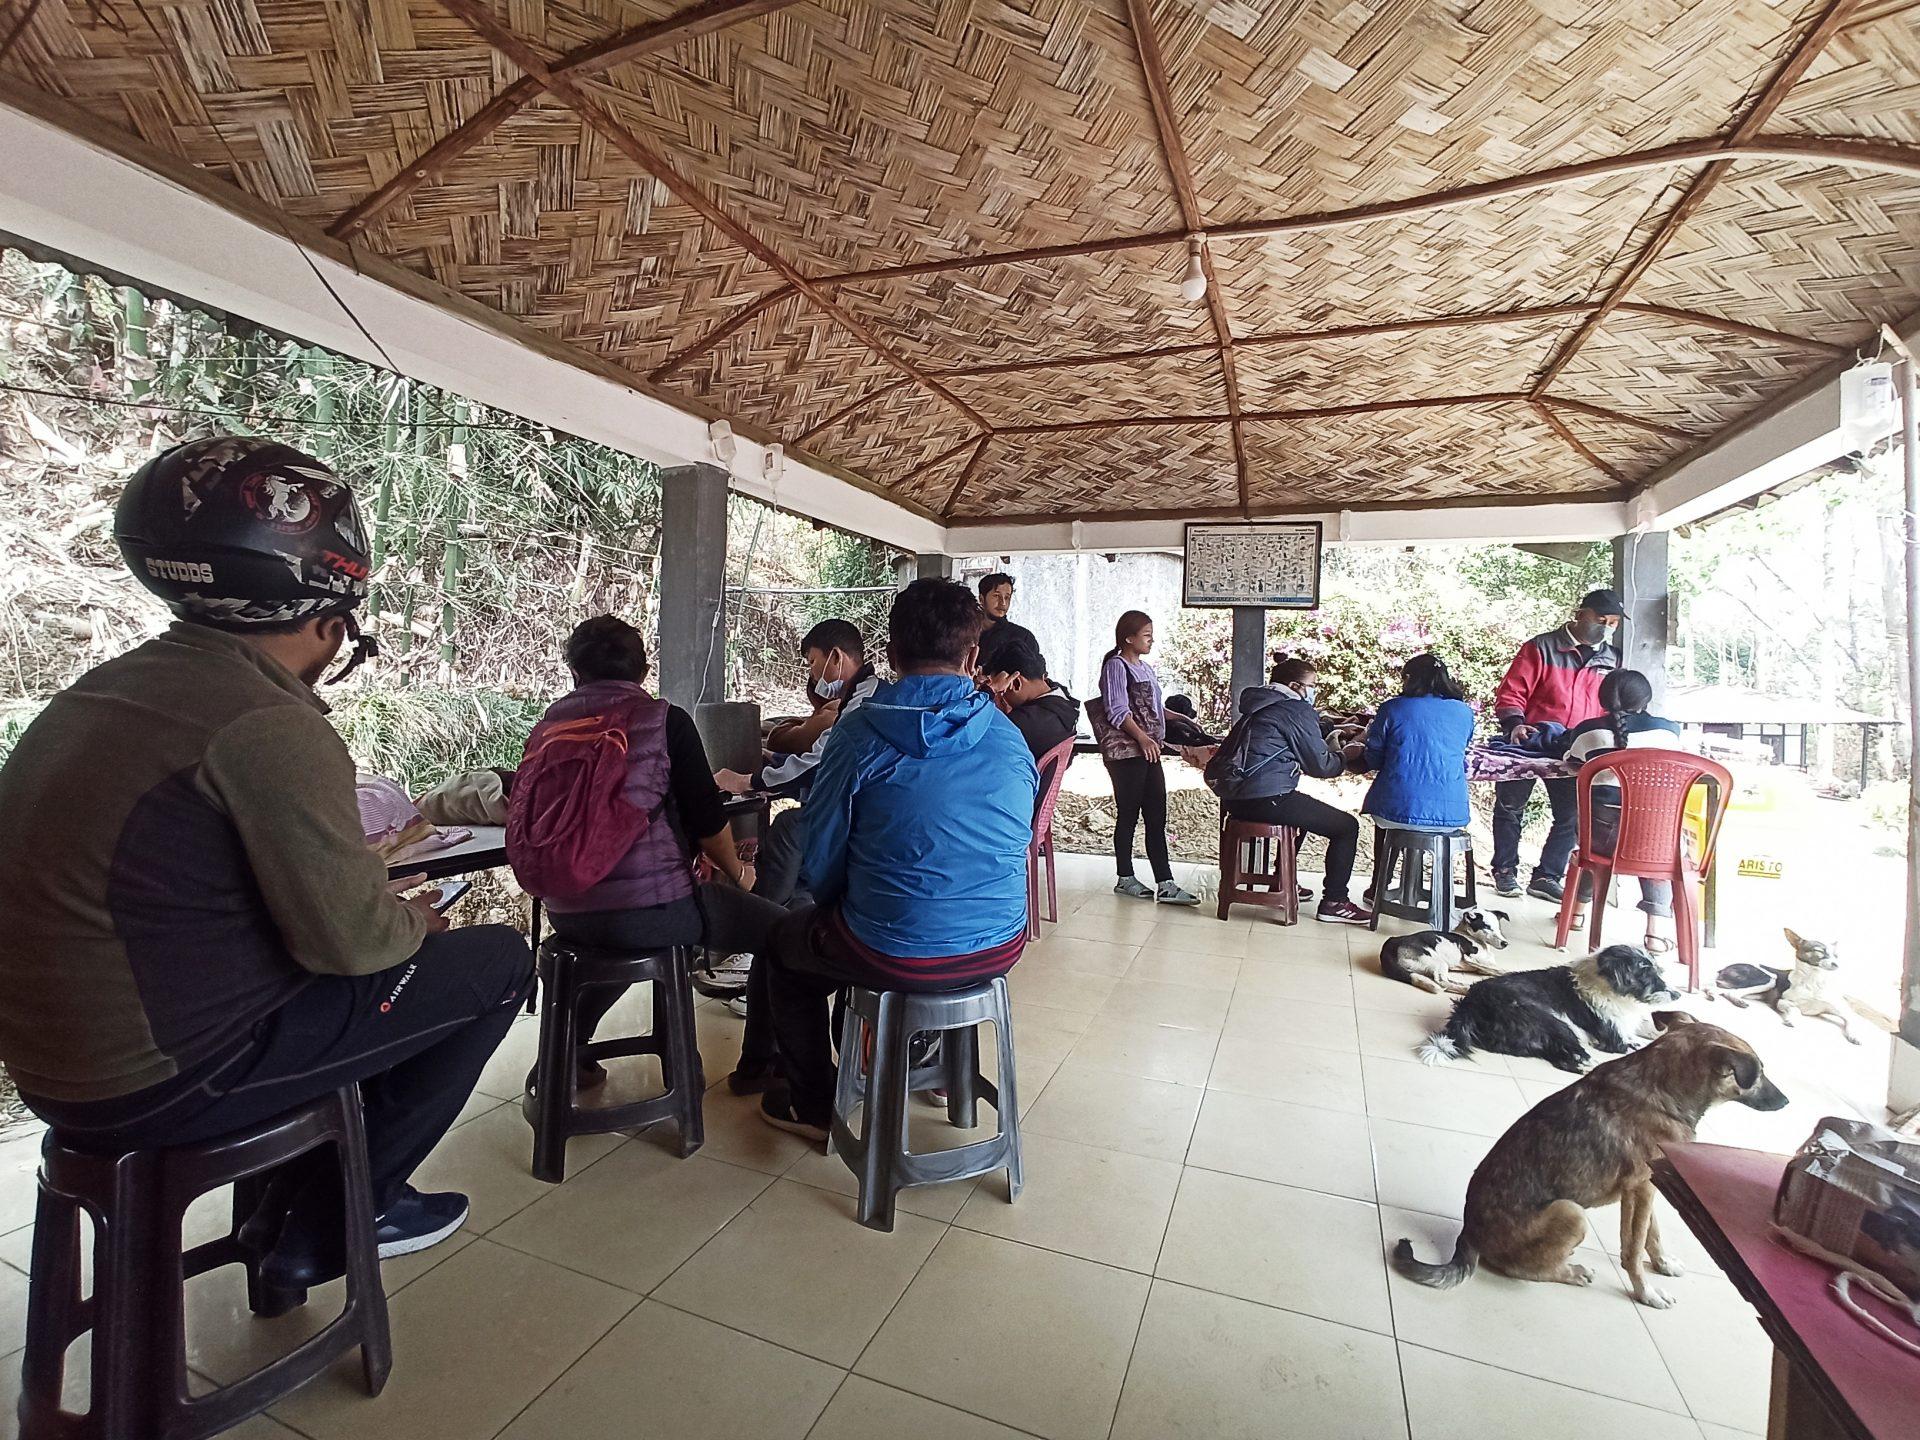 Onwers waiting as their dogs receive treatment against their ailments